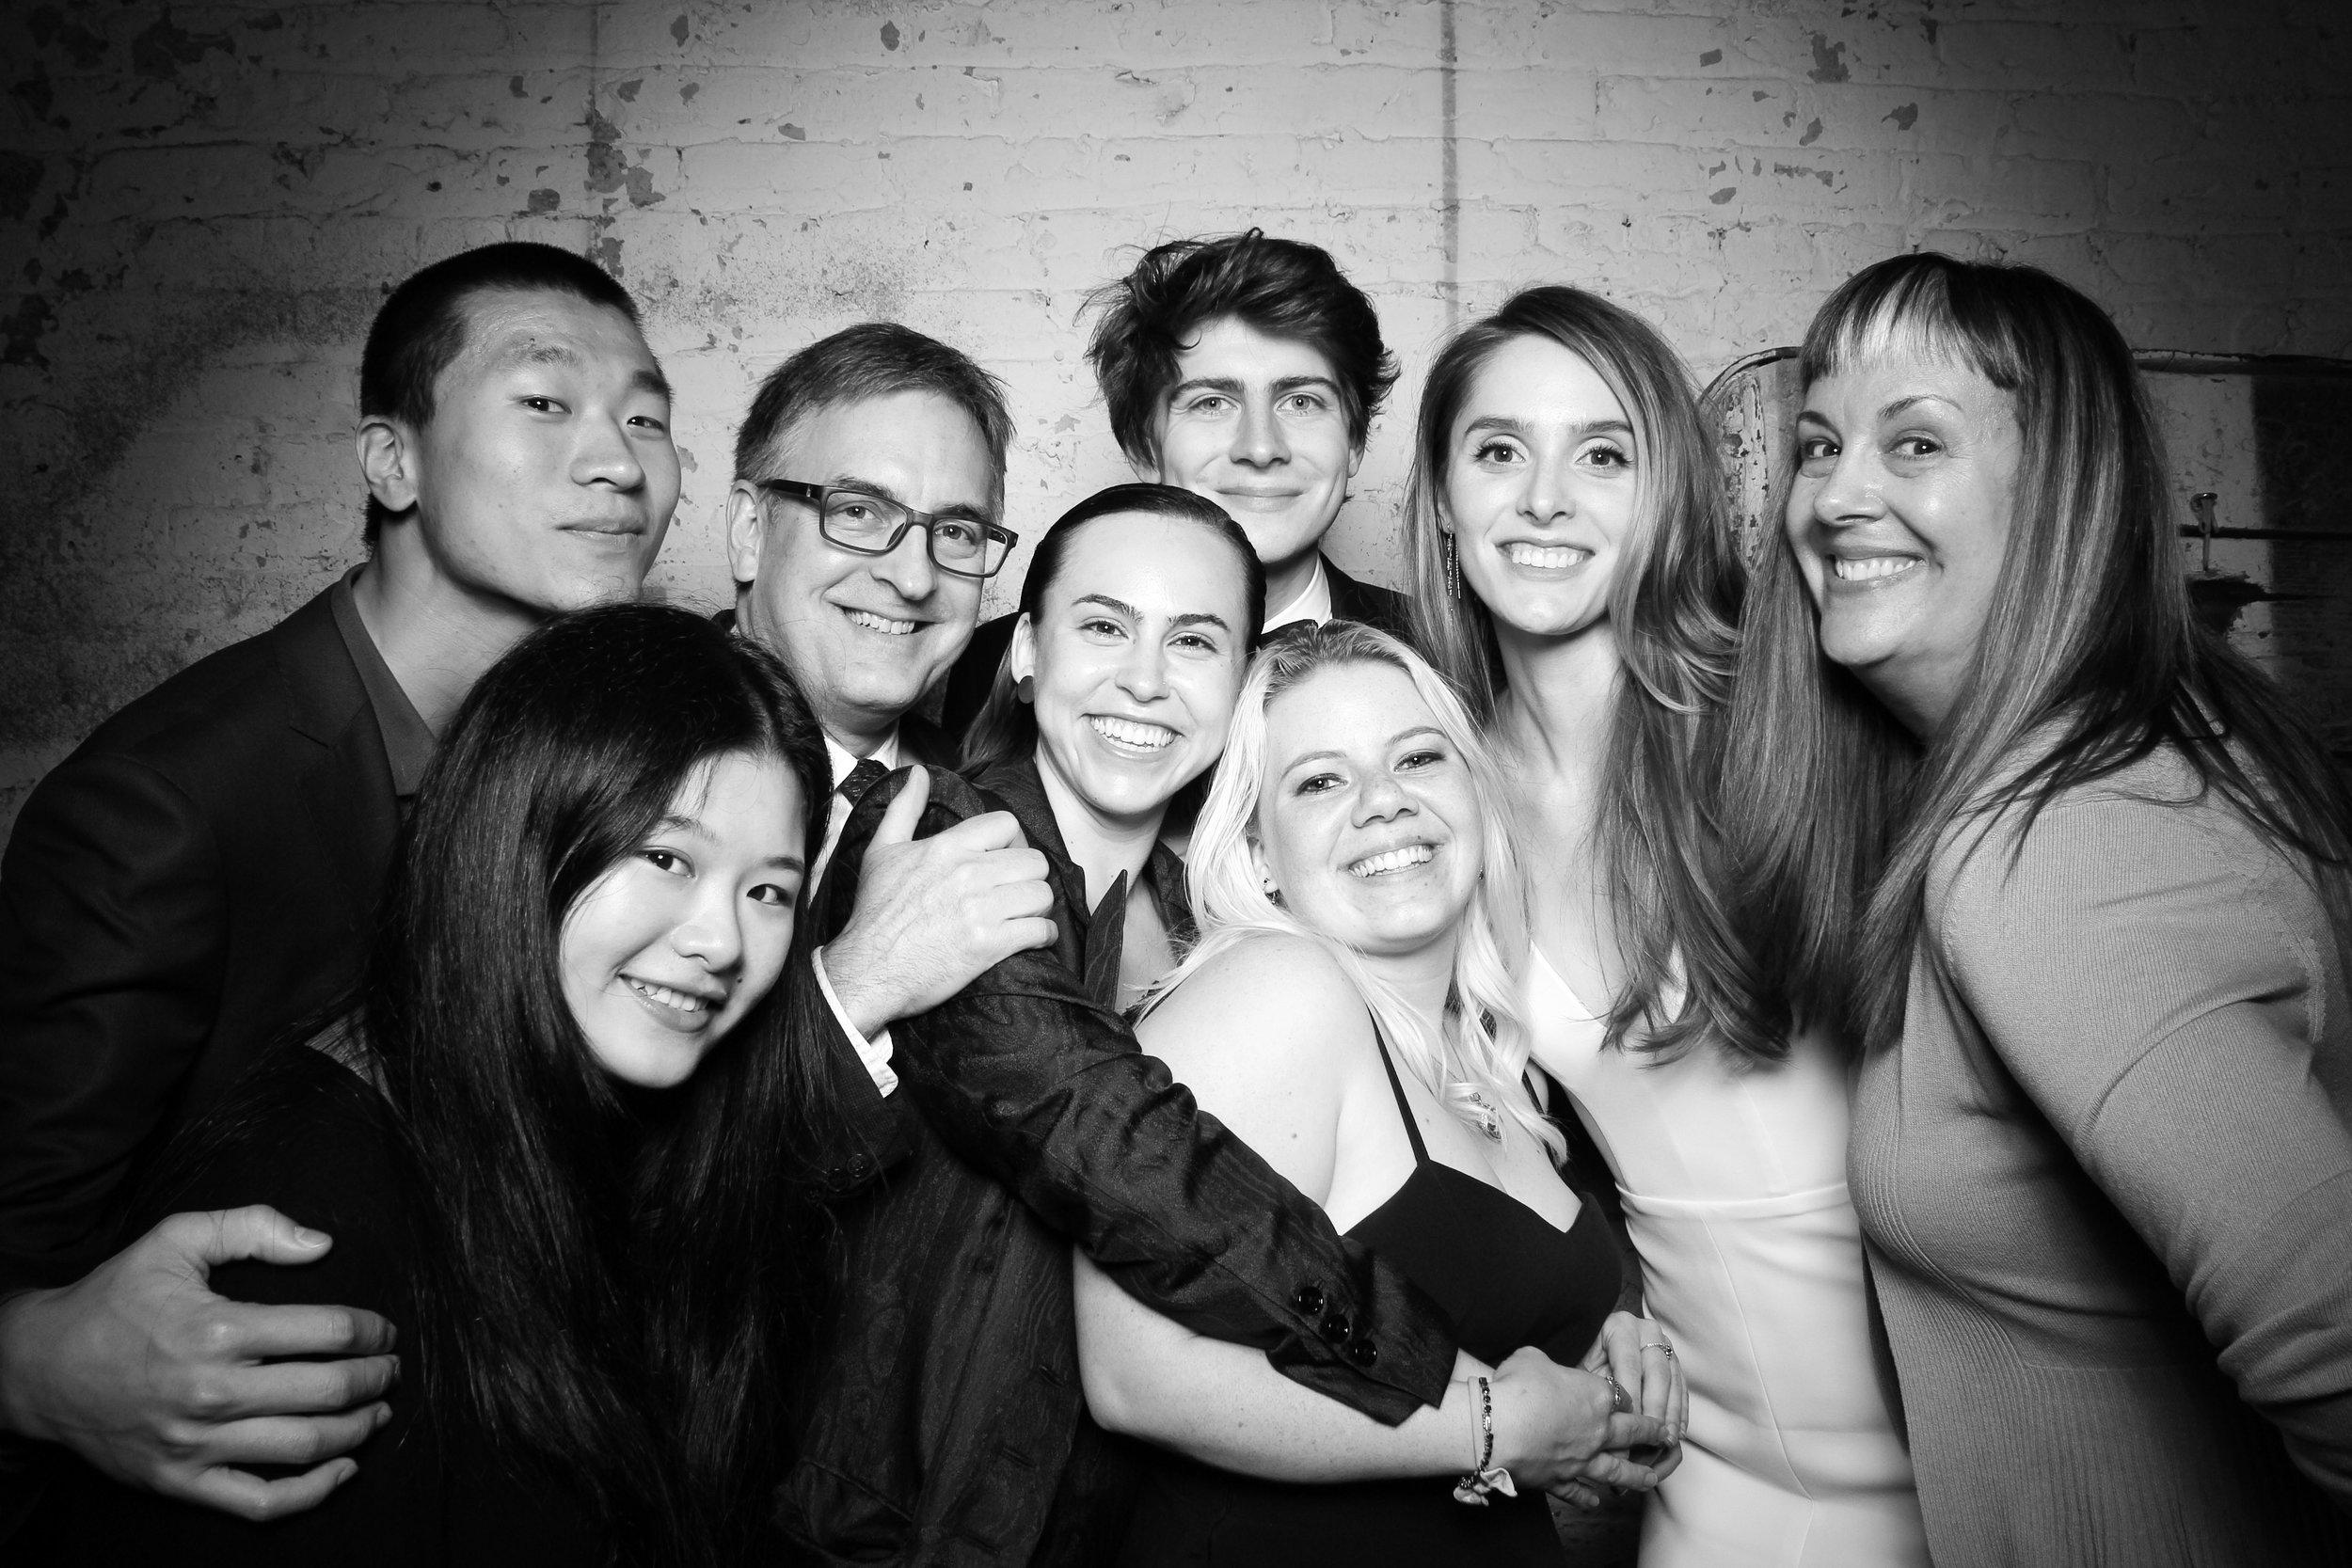 The_Joinery_Wedding_Venue_Logan_Square_Reception_18.jpg